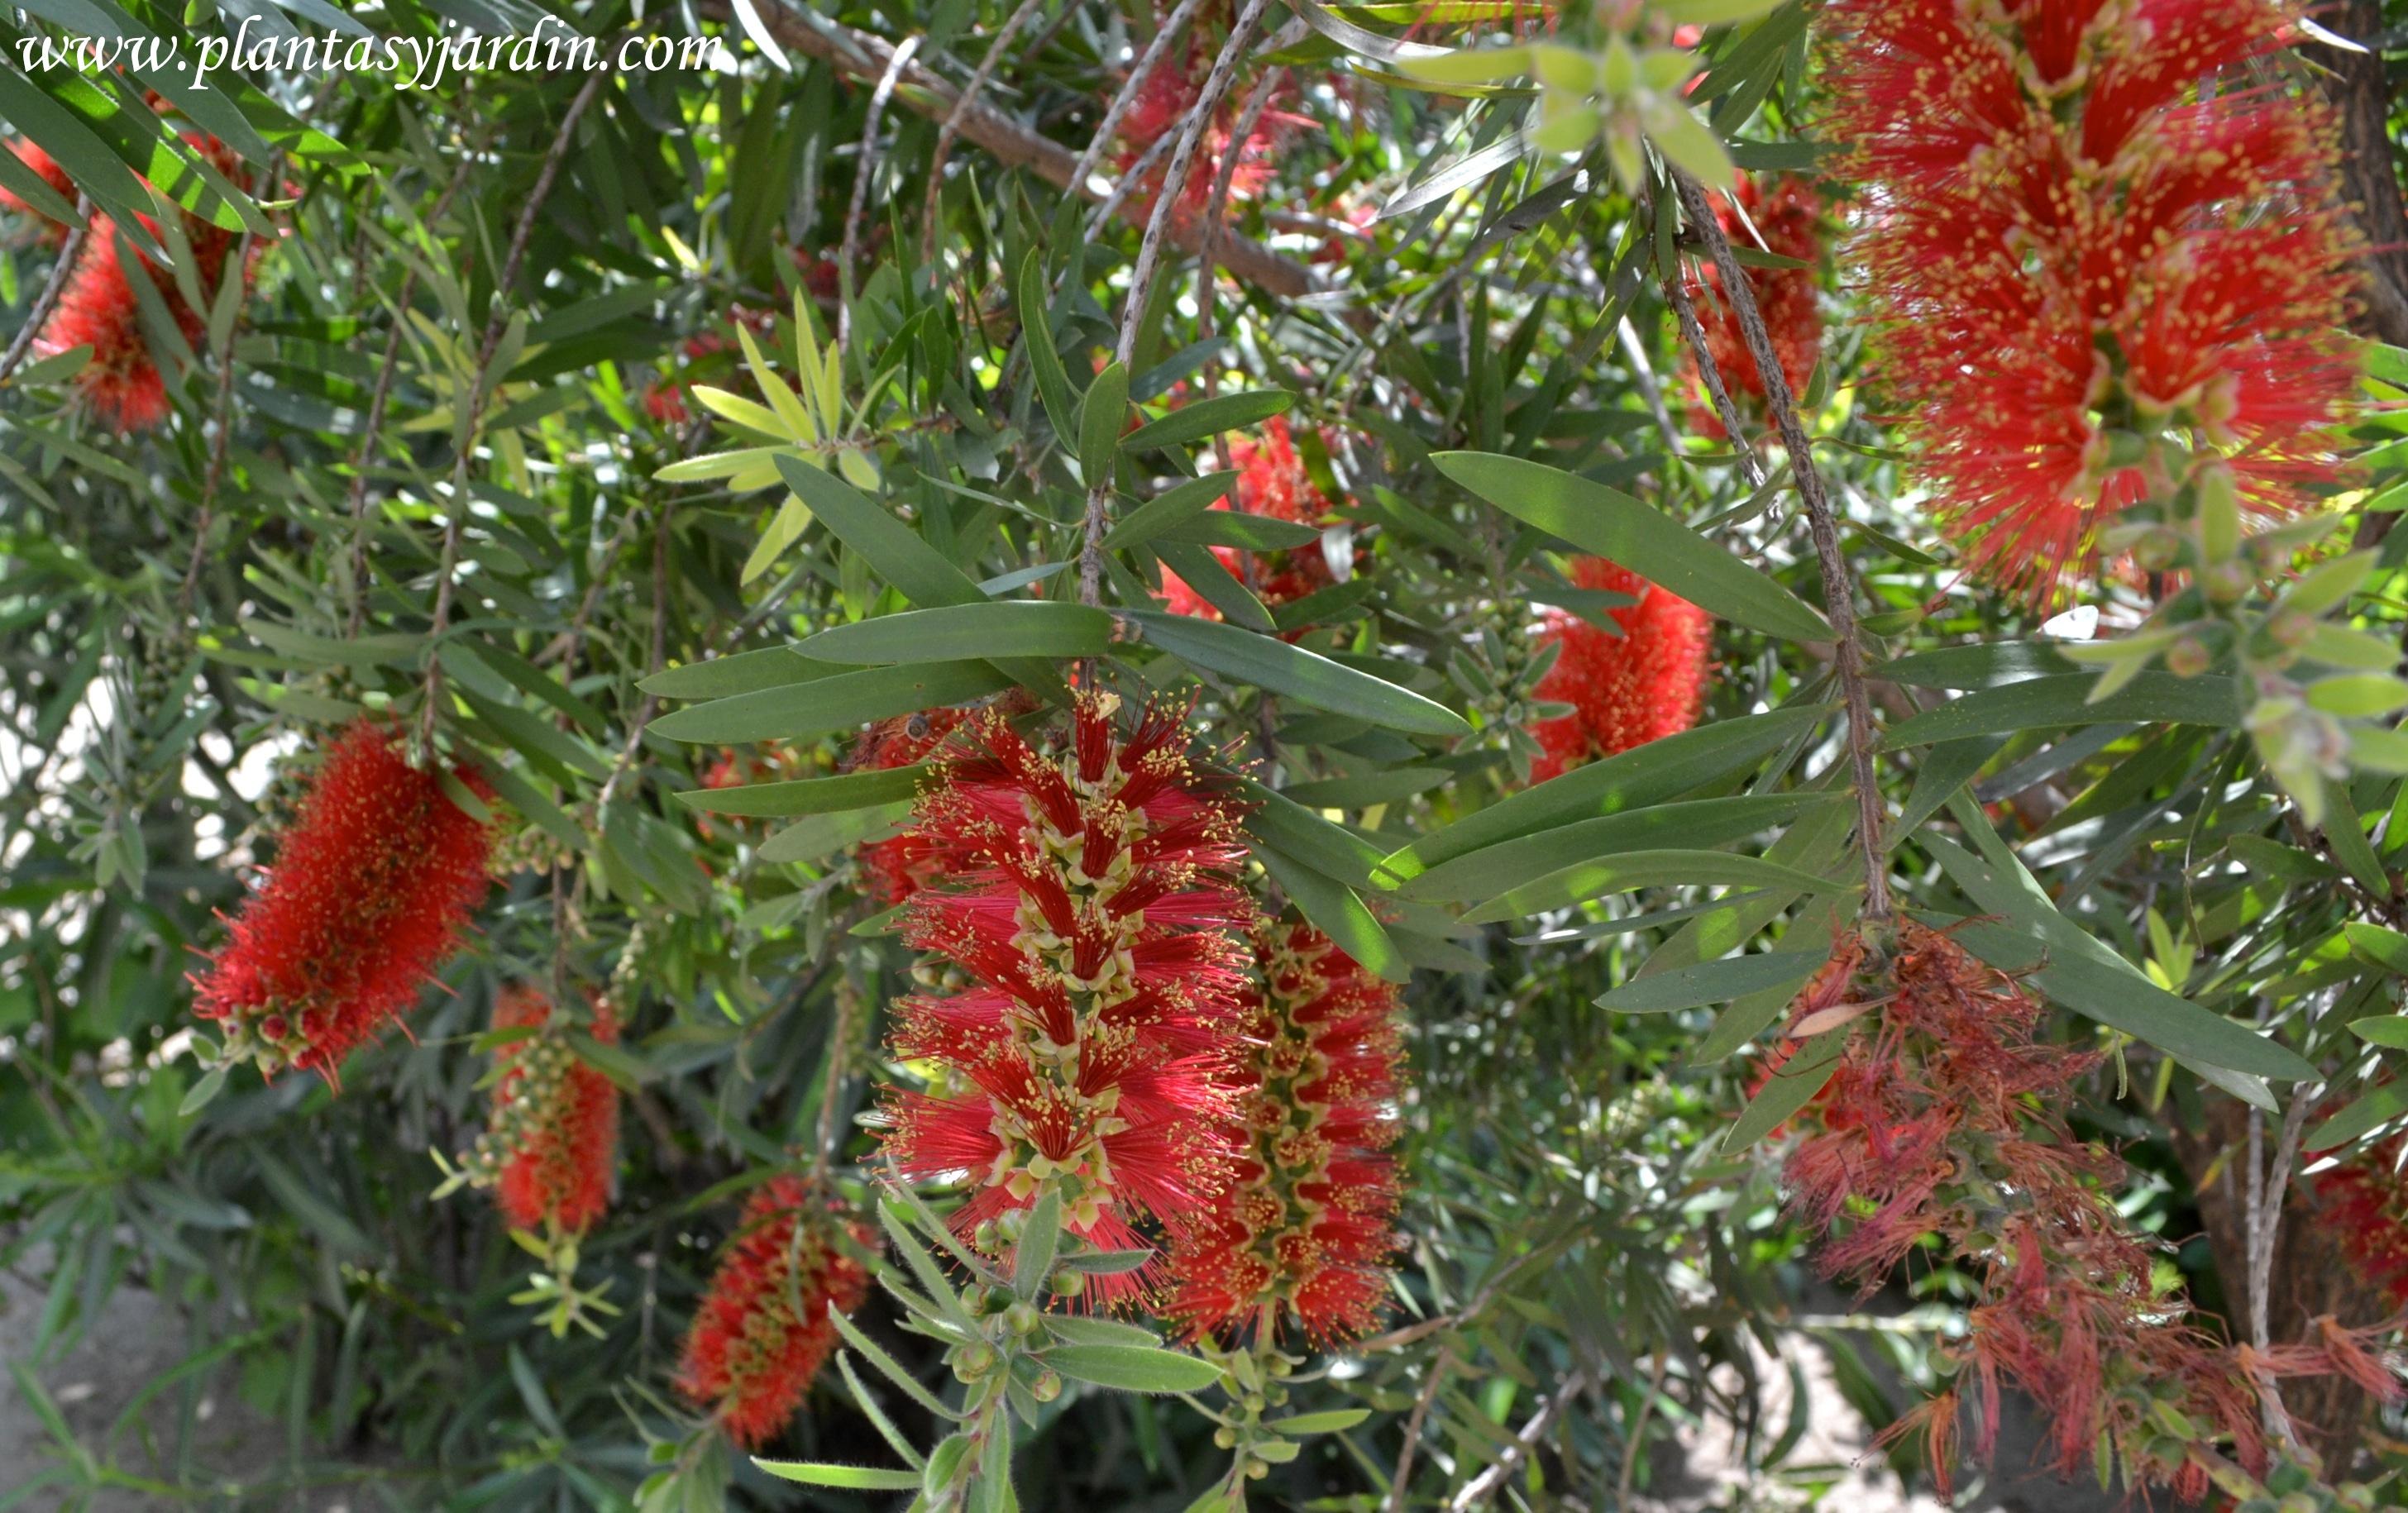 http://plantasyjardin.com/wp-content/uploads/2011/08/Callistemon-viminallis-Red-Cascade-detalle-floraci%C3%B3n-a-finales-de-la-primavera..jpg